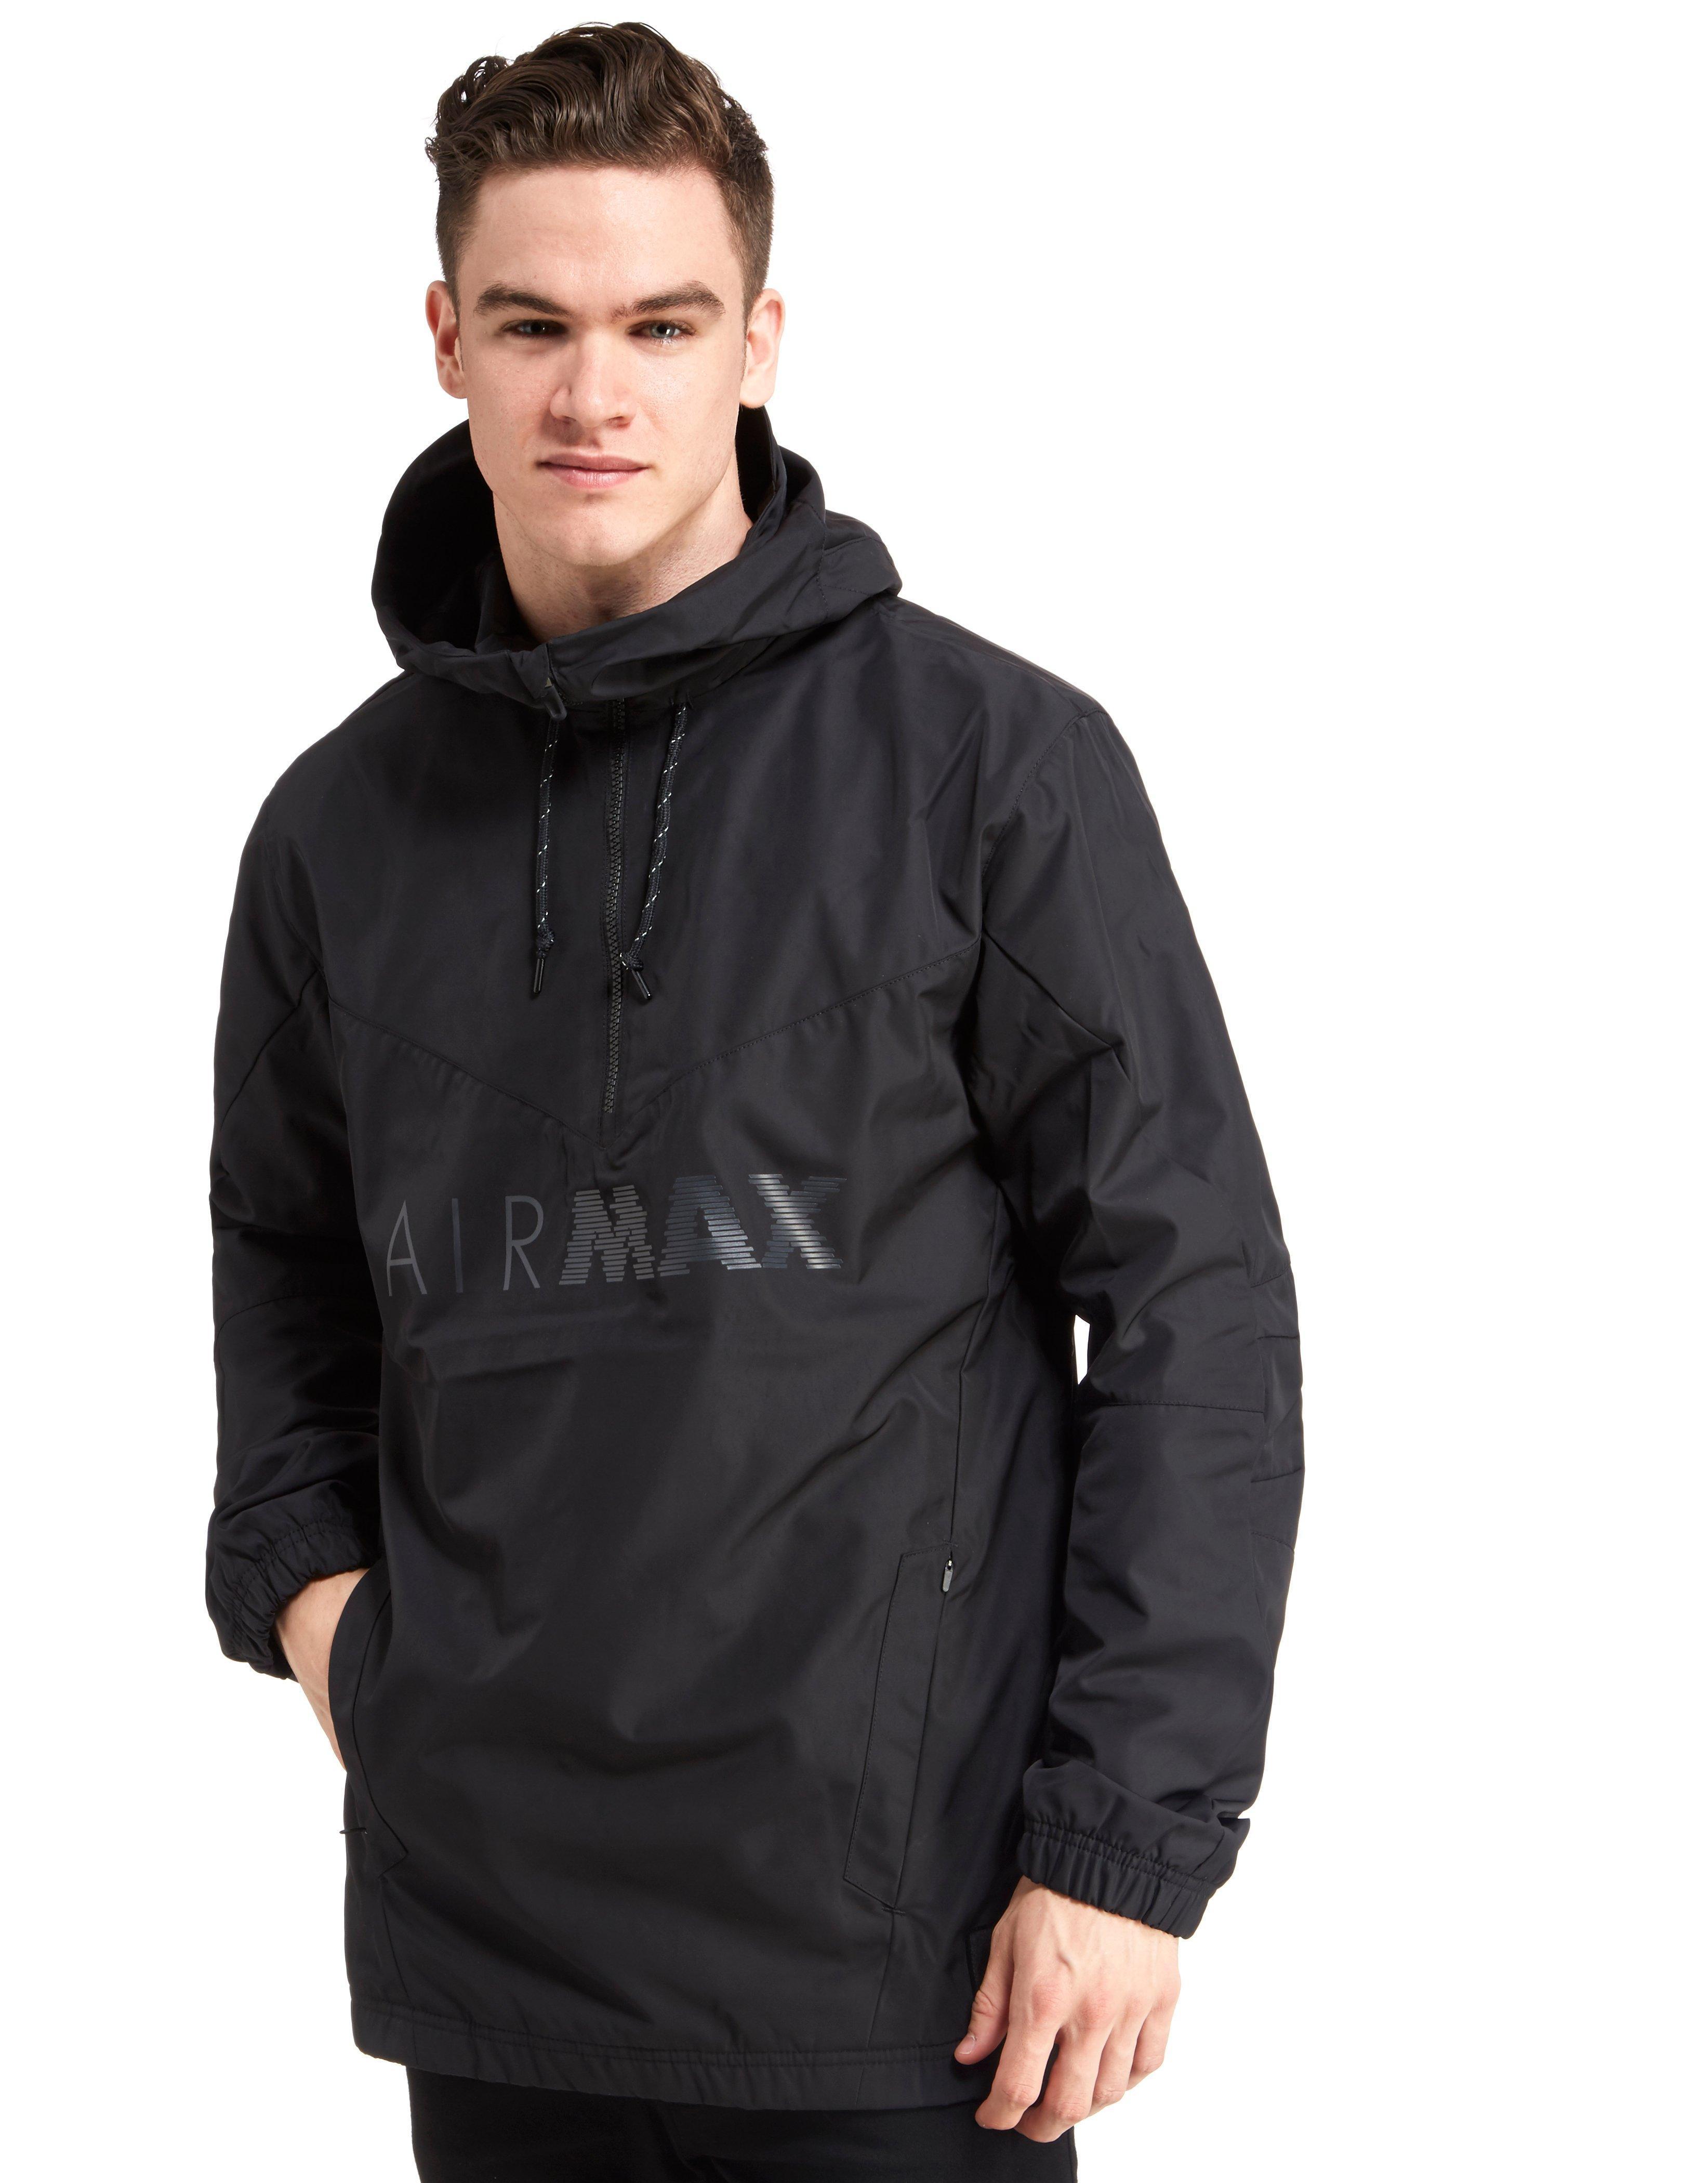 d18b1042f3 Nike Air Max Half Zip Chevron Jacket in Black for Men - Lyst